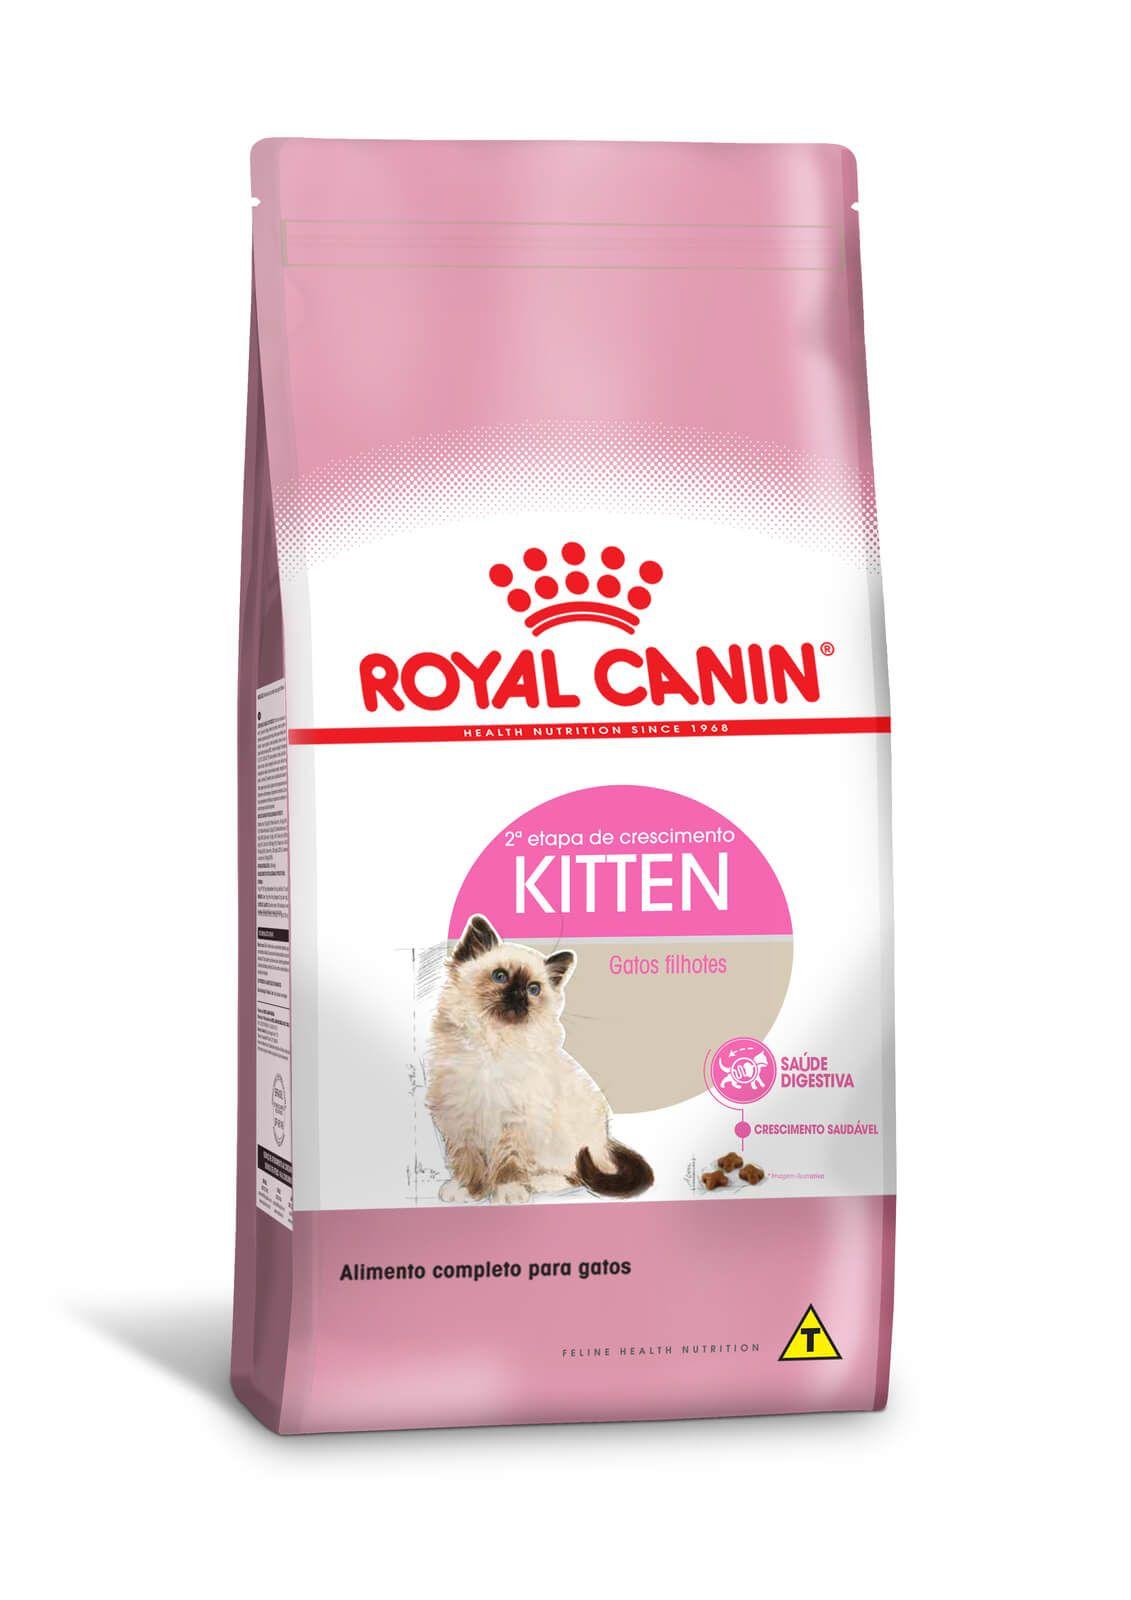 Ração Royal Canin Kitten - Gatos Filhotes